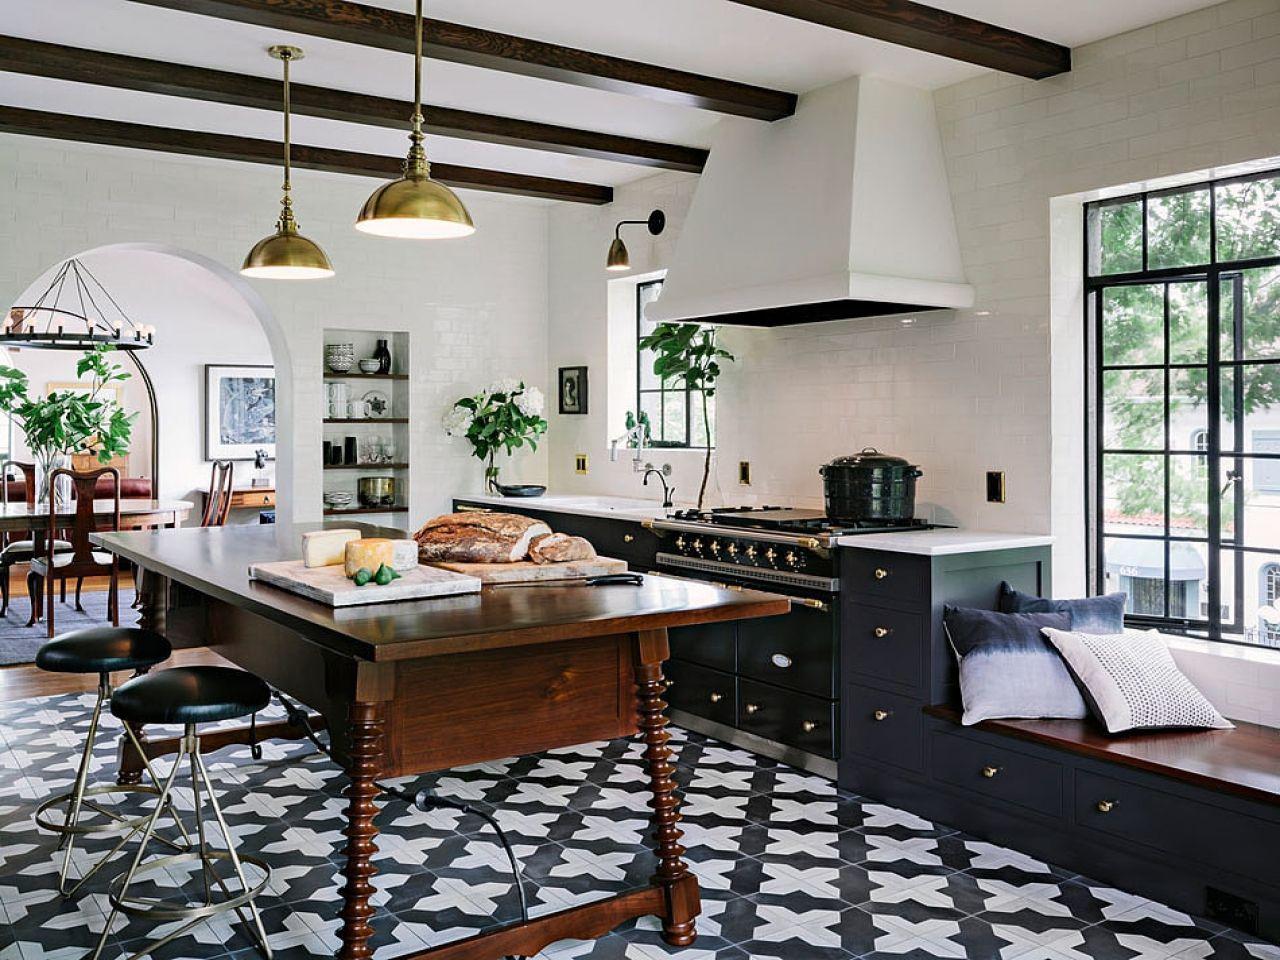 Spanish kitchen design